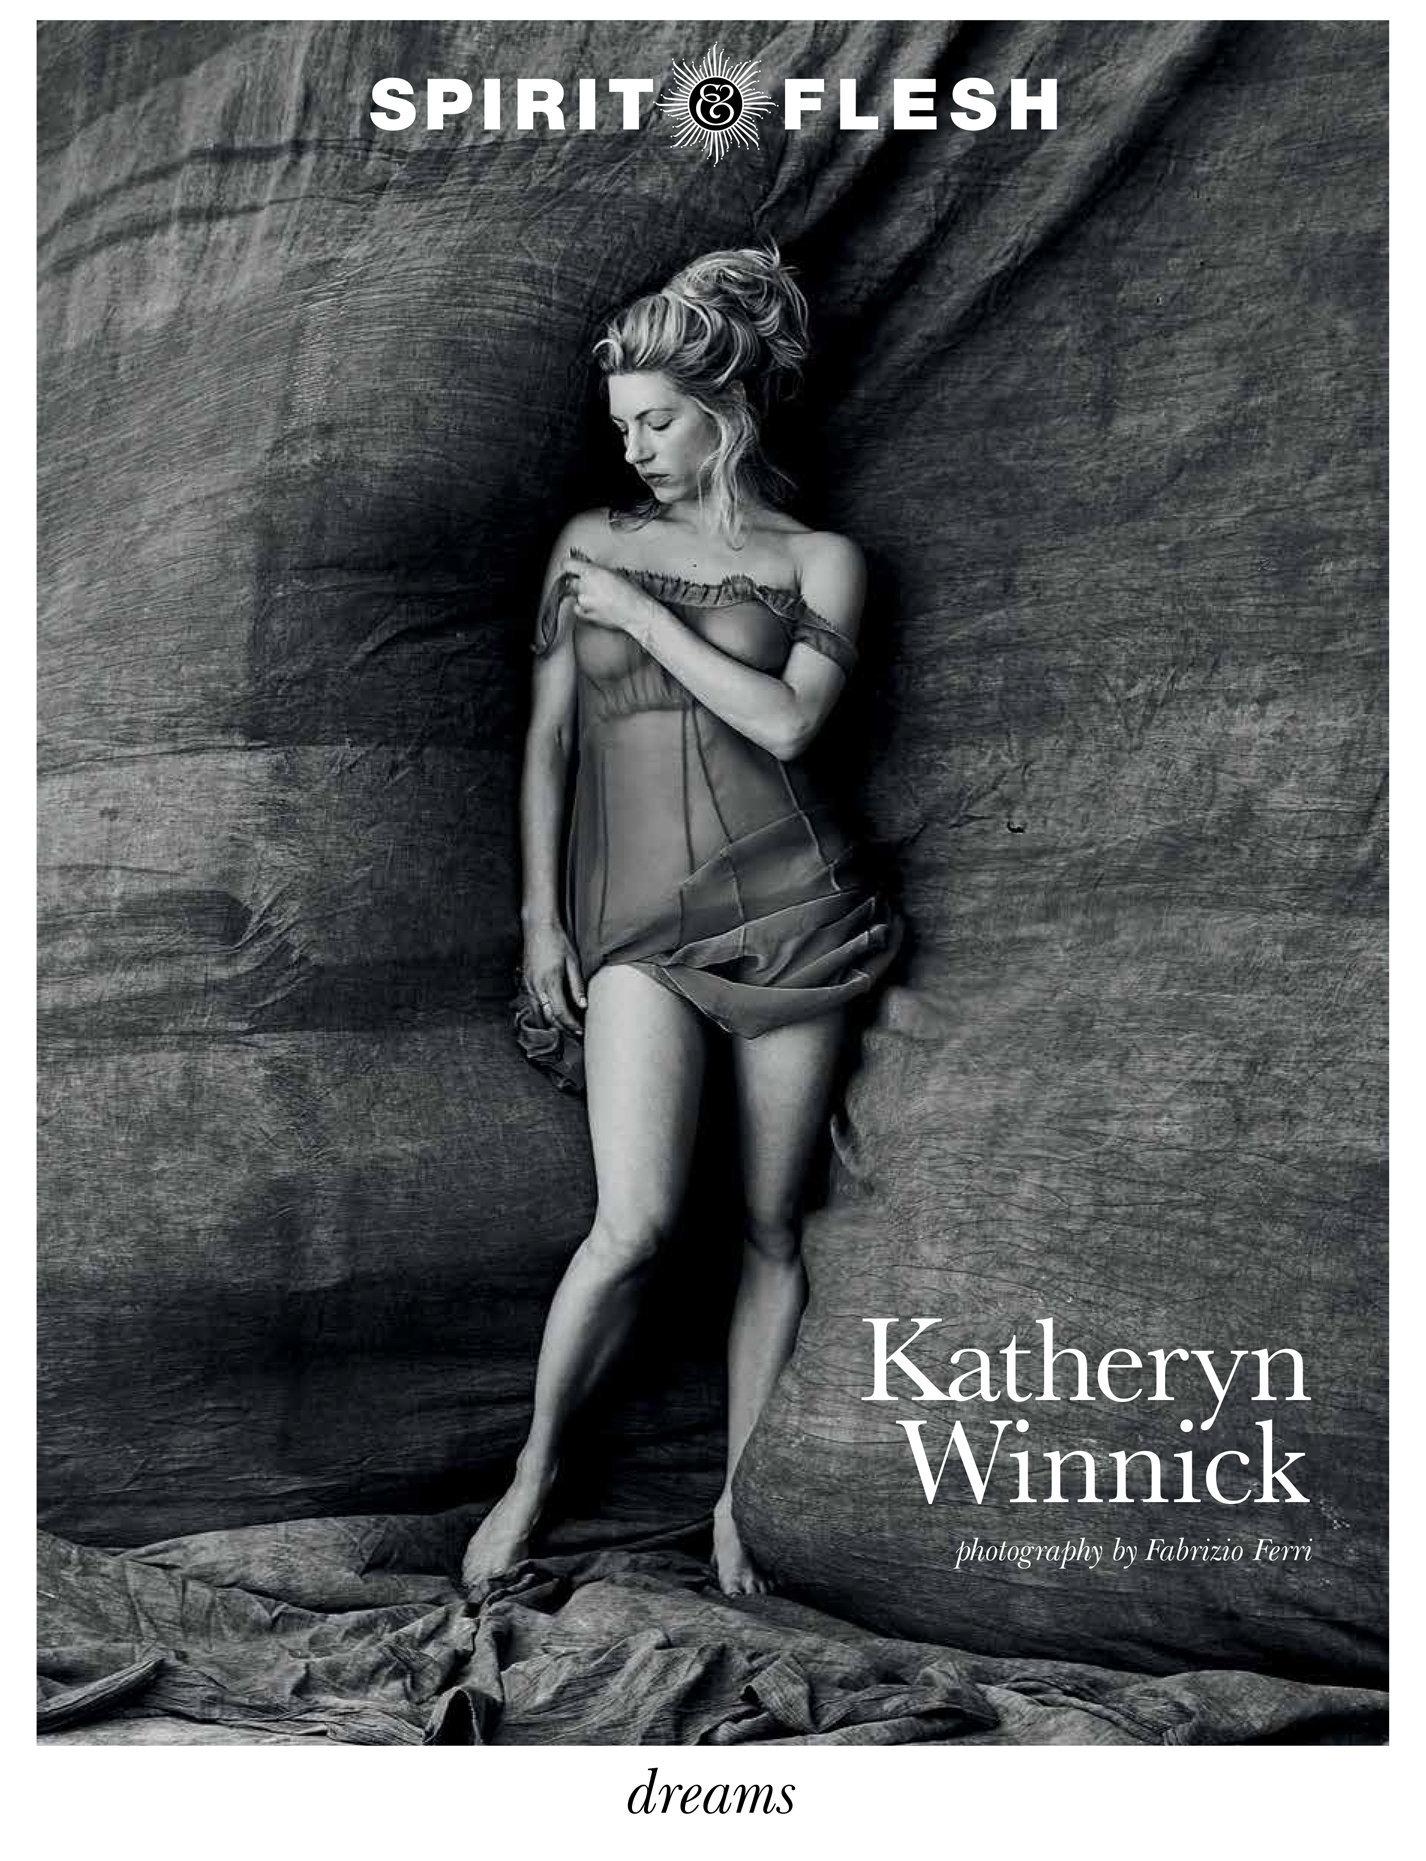 Erotica Katheryn Winnick nudes (23 foto and video), Tits, Cleavage, Instagram, butt 2018